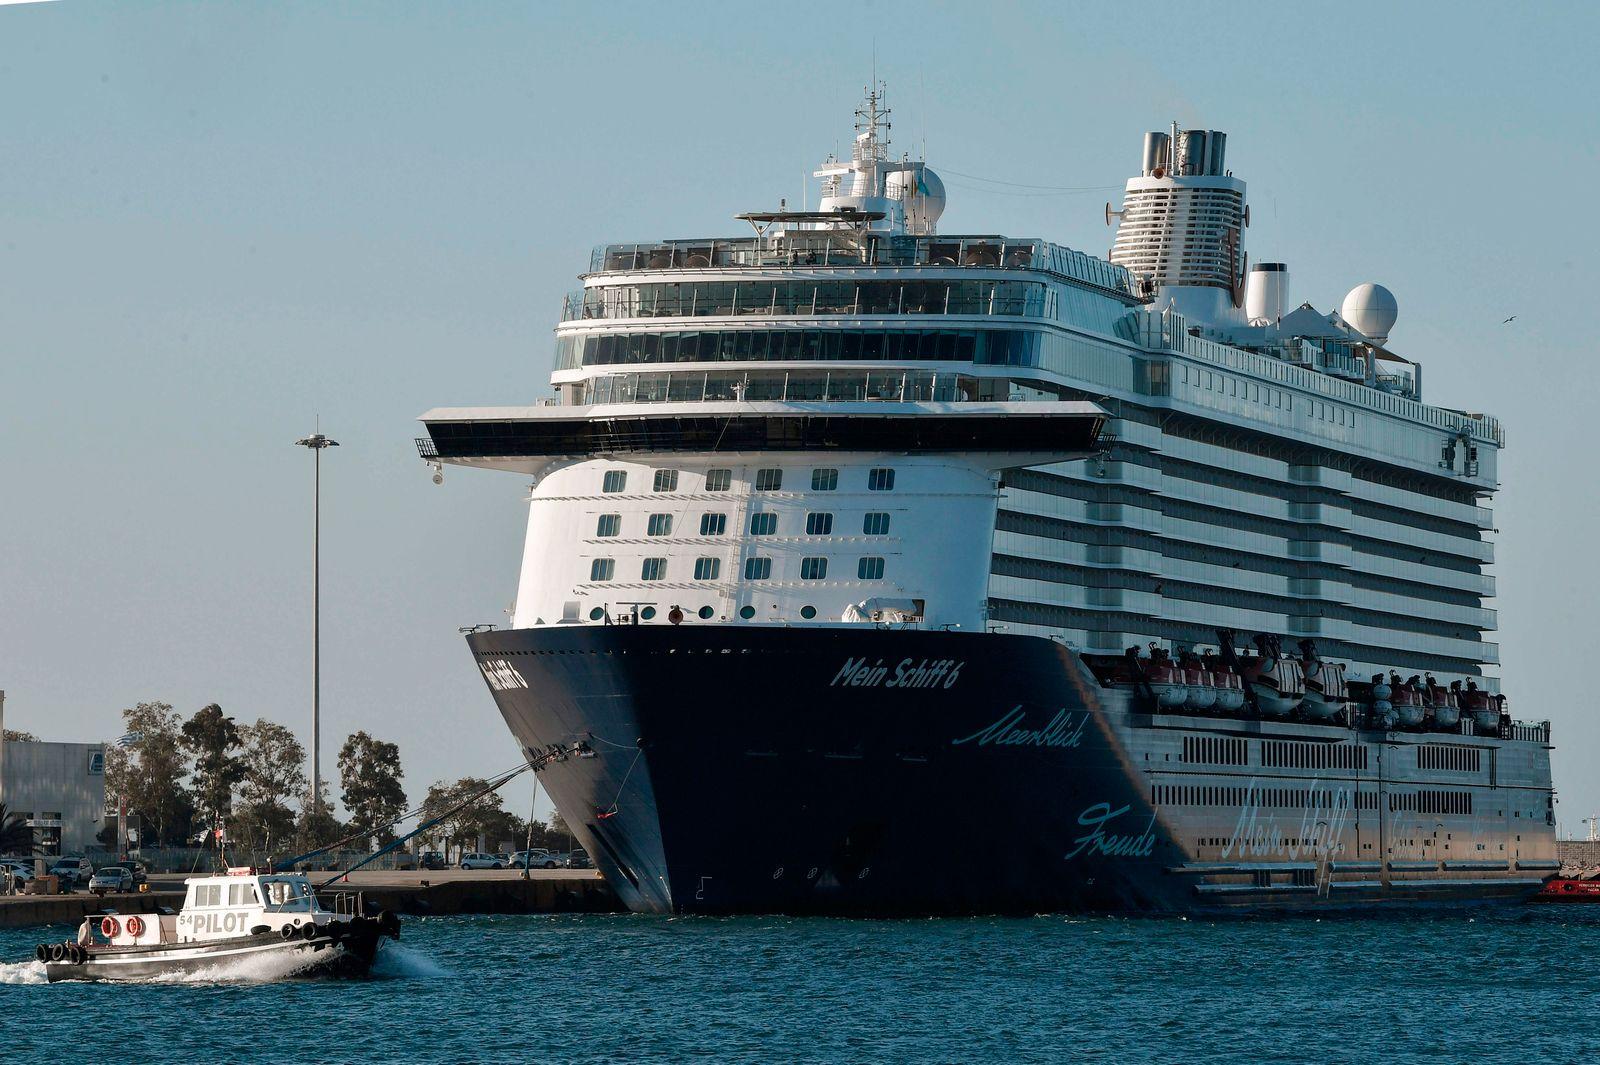 GREECE-TRAVEL-TOURISM-CRUISE-HEALTH-VIRUS